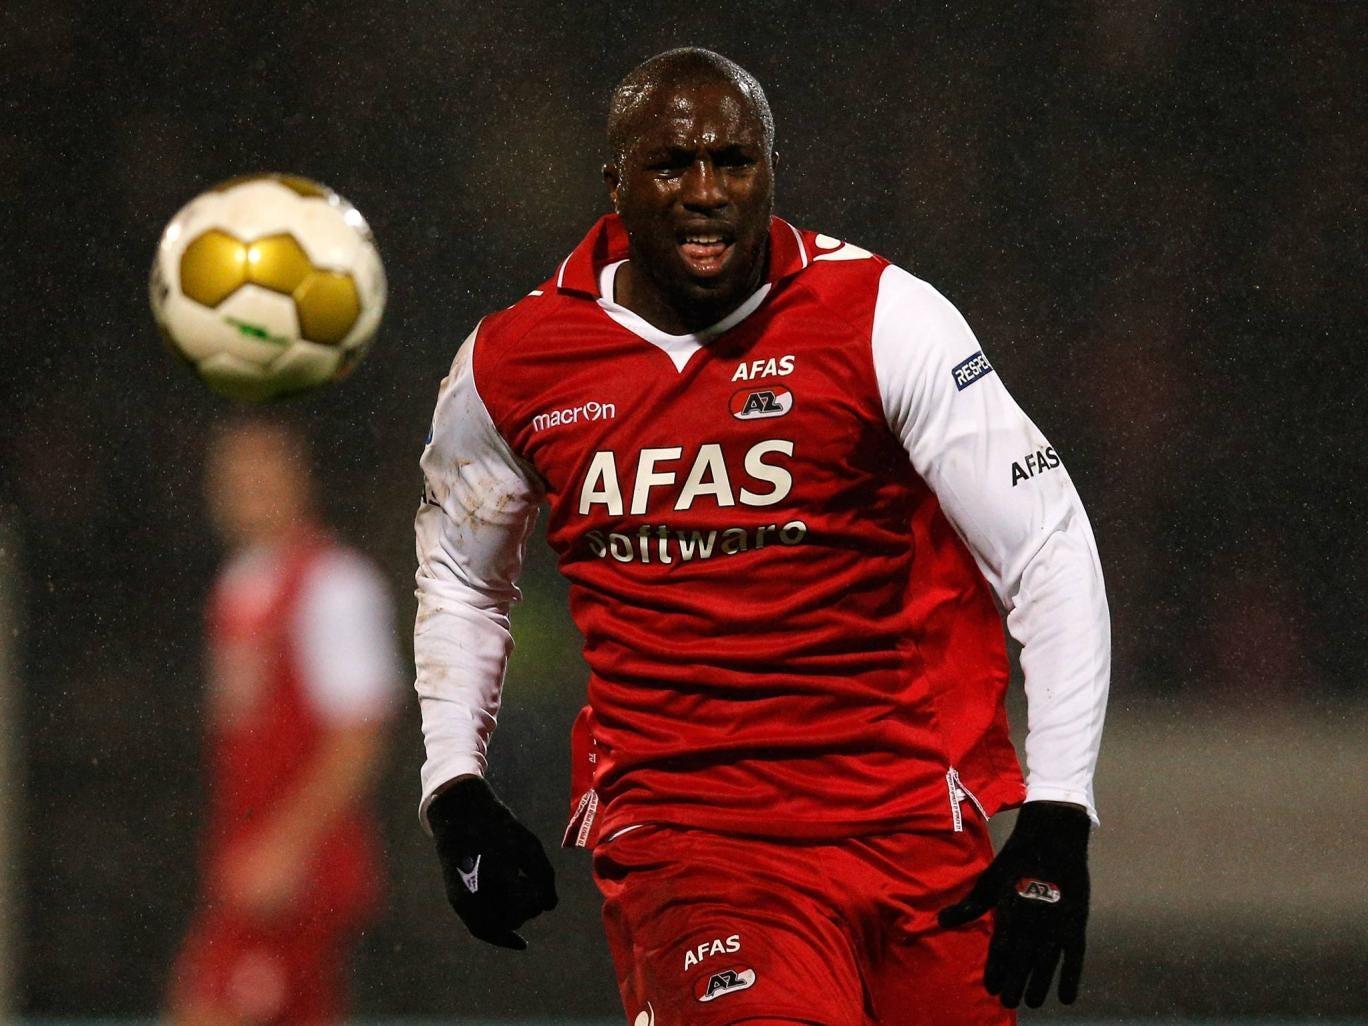 Jozy Altidore in action for AZ Alkmaar against FC Den Bosch